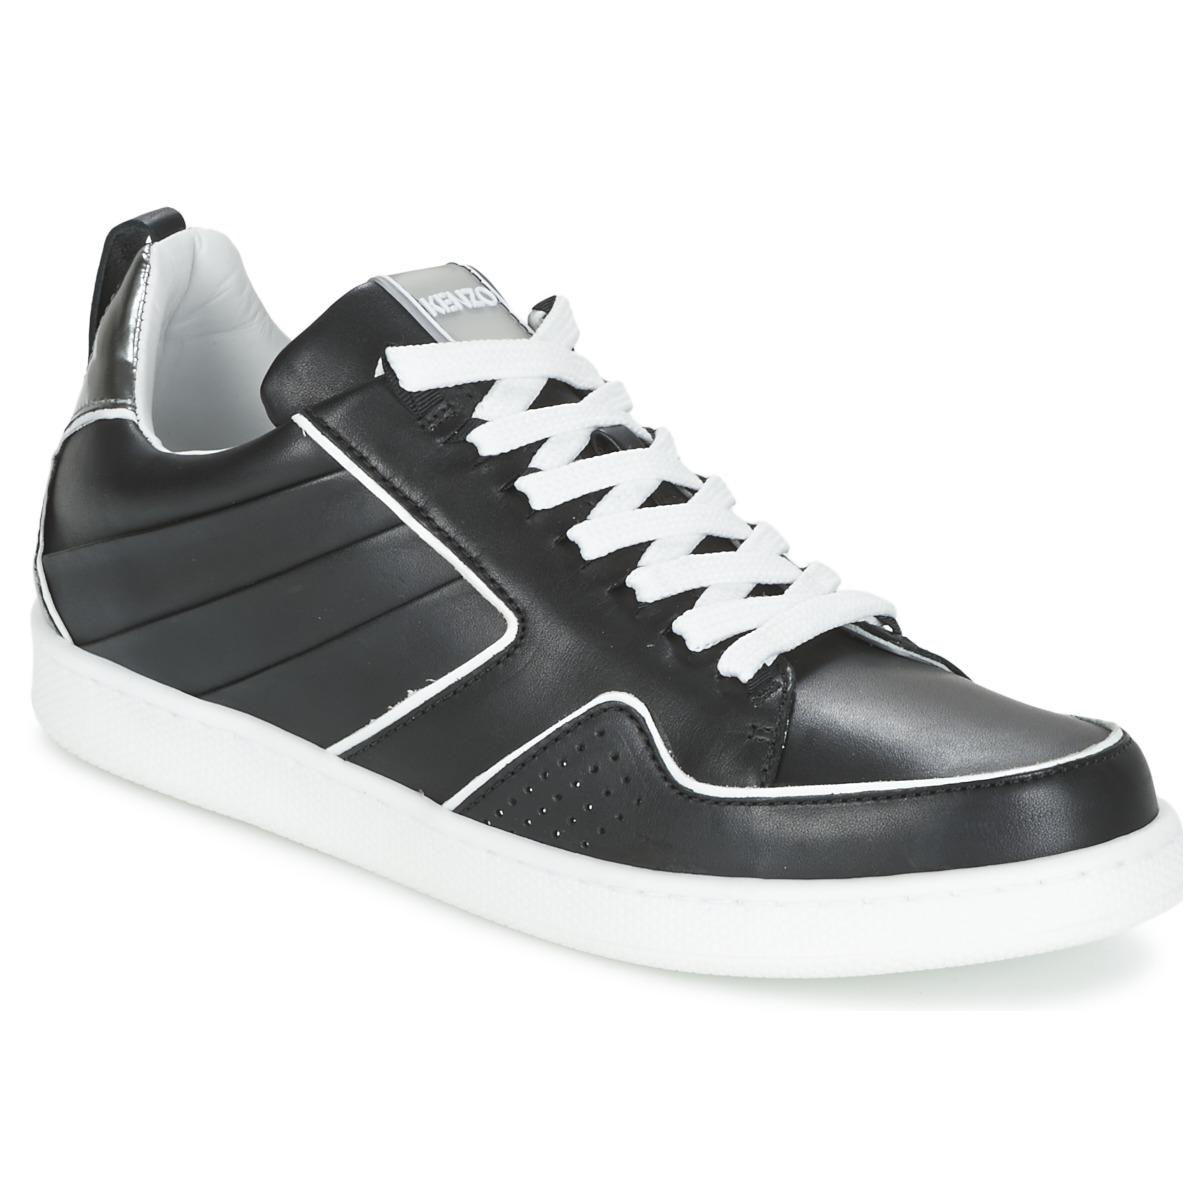 4d984c3fff936f Kenzo K-FLY Schwarz   Silbern - Kostenloser Versand bei Spartoode ! - Schuhe  Sneaker Low Damen 165